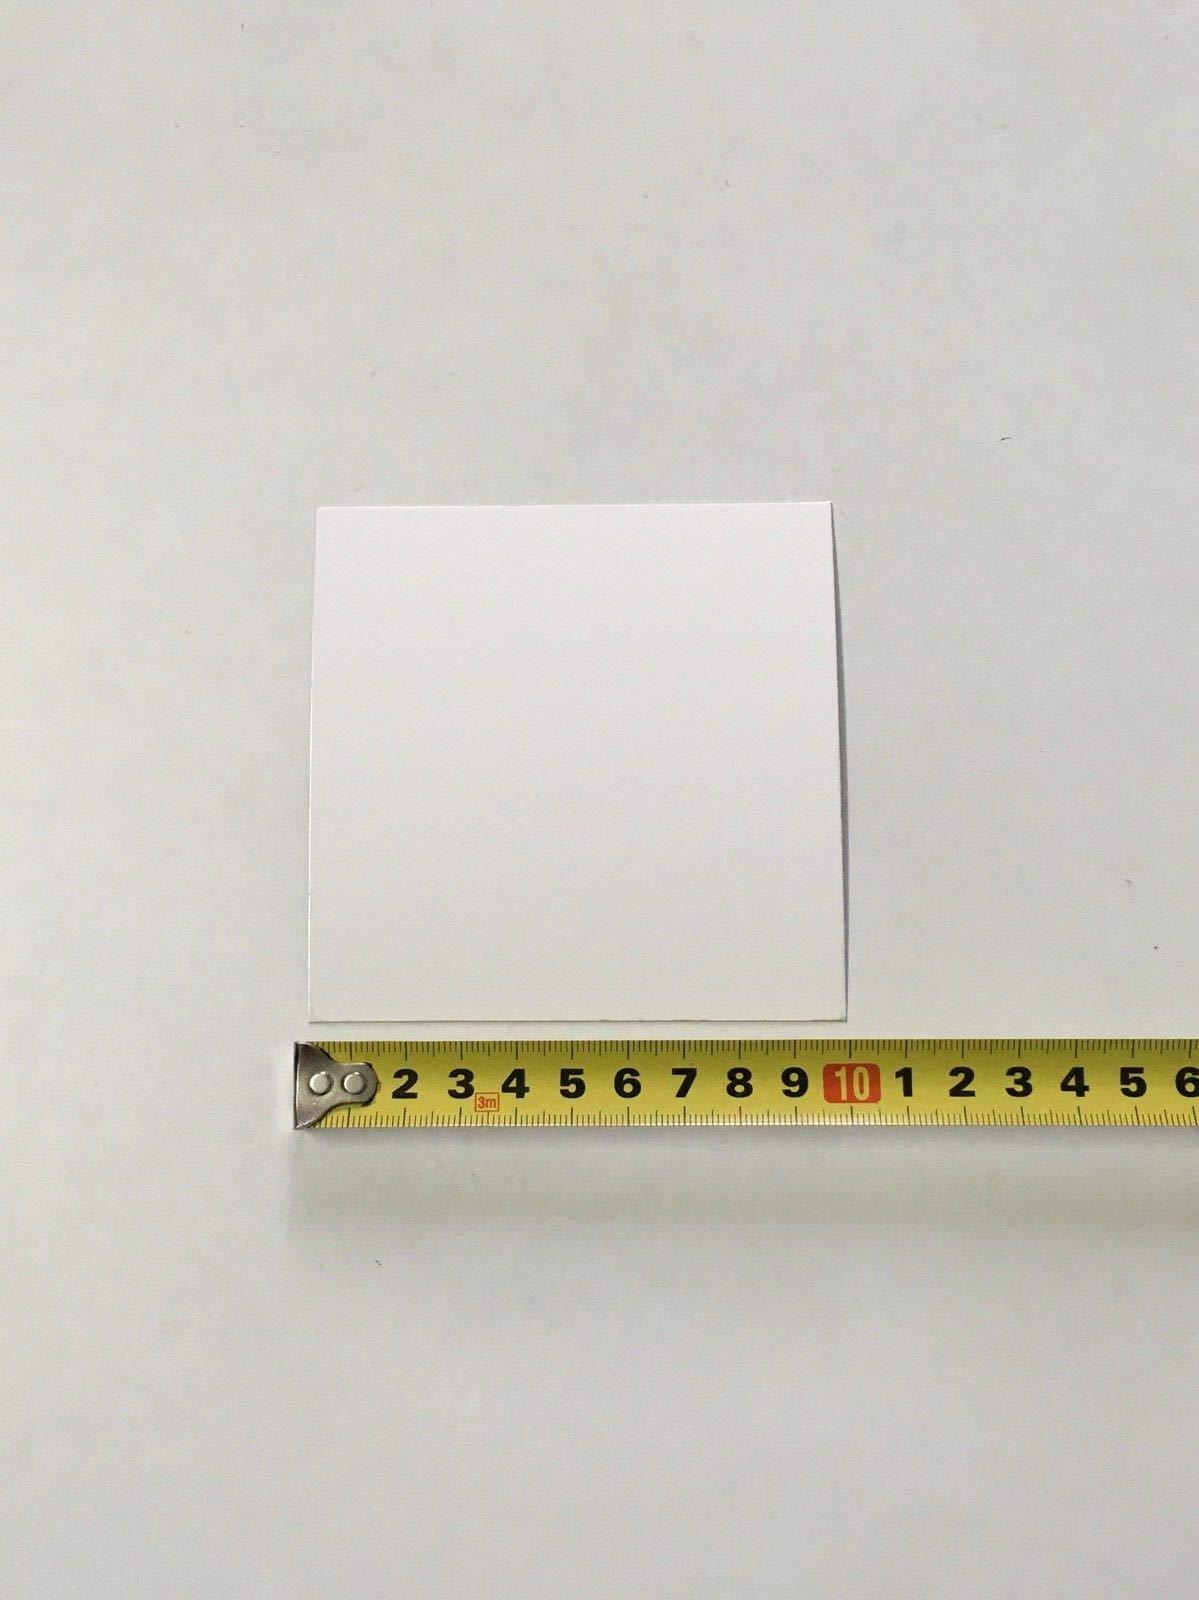 AAdvance Instruments TLC Plates Aluminum Backed Silica Gel 60 F254 10cm x 10cm 20/Box by AAdvance Instruments